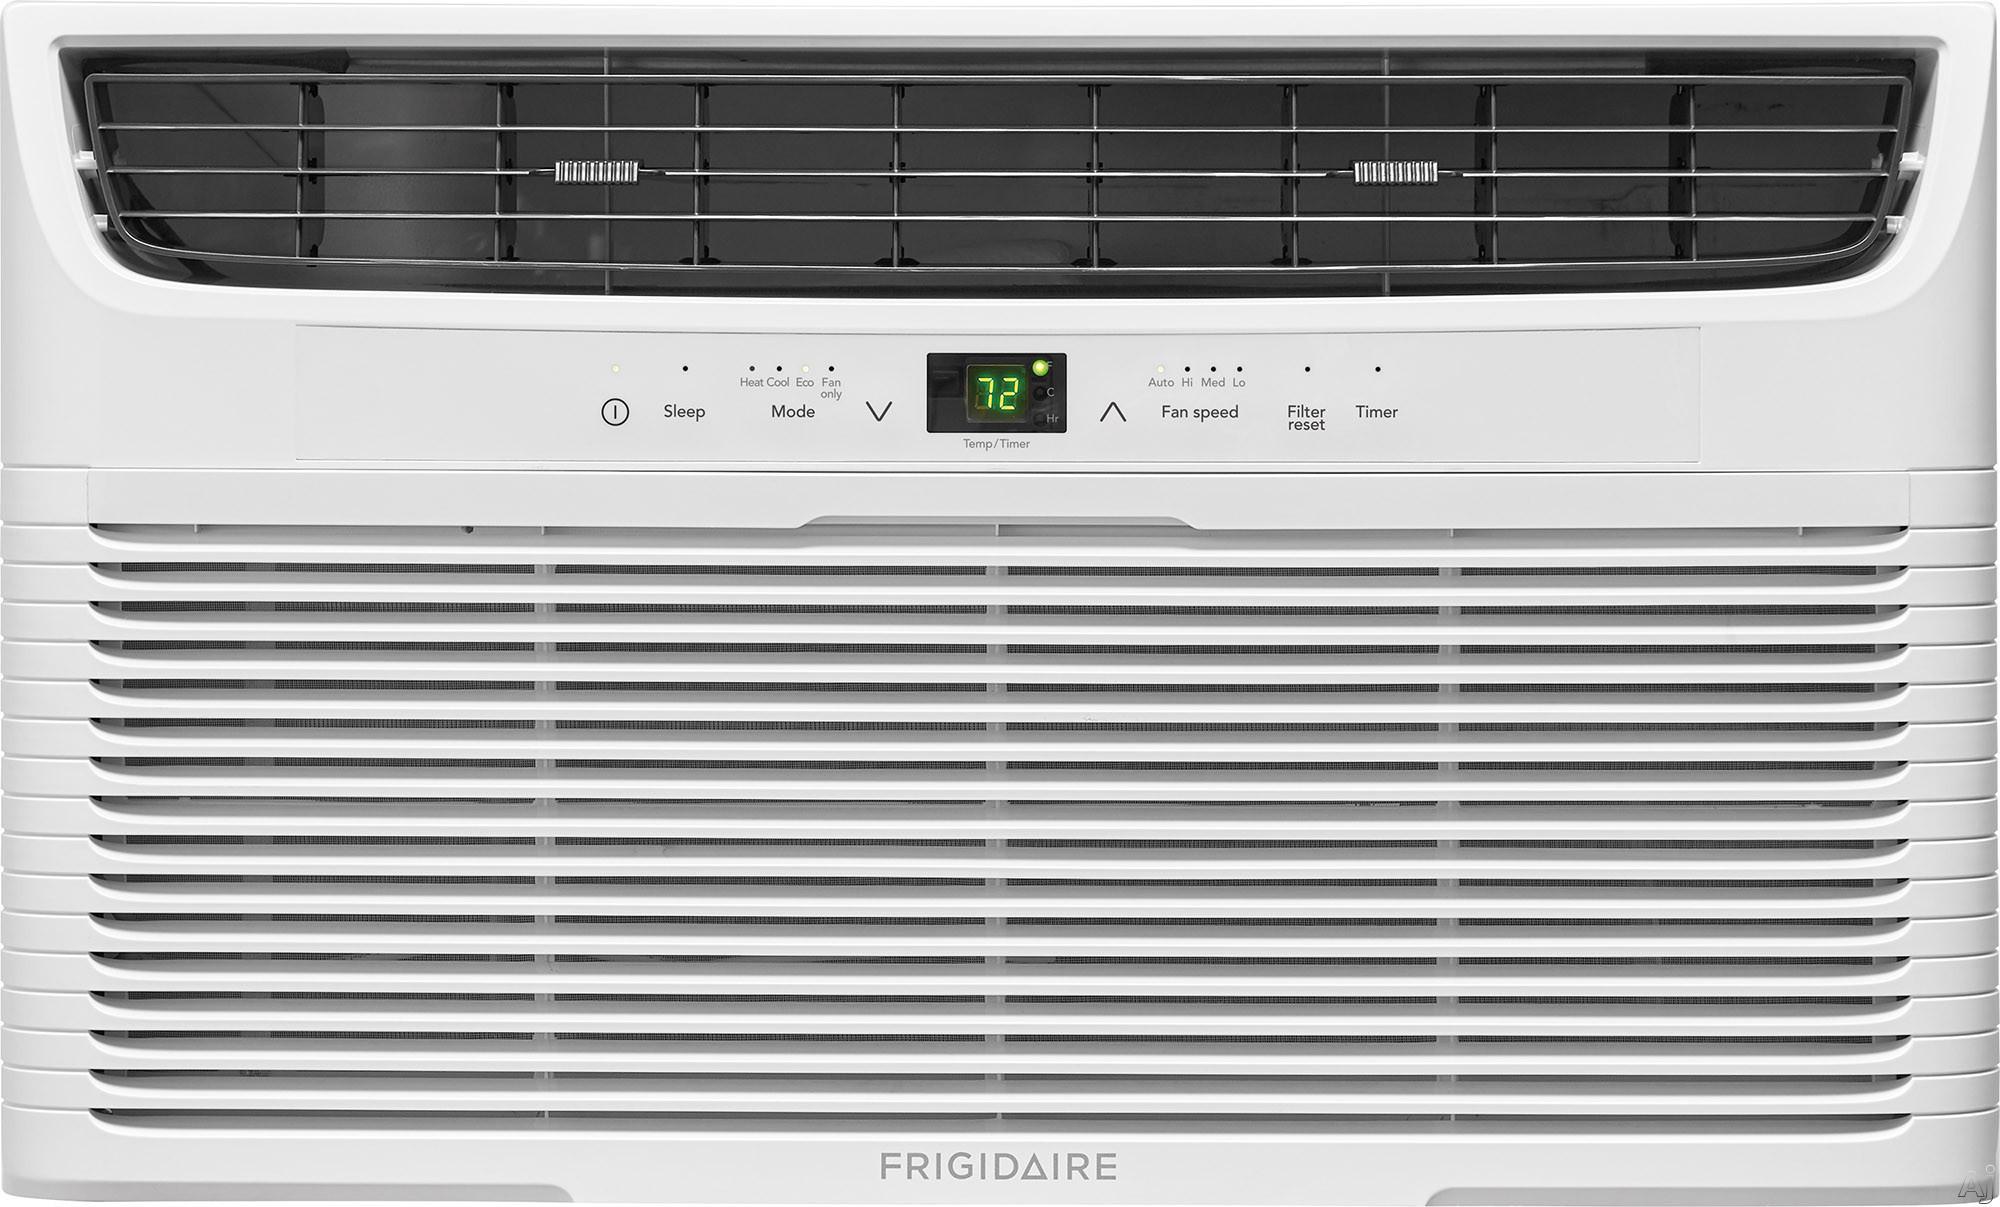 "Frigidaire FFTH1022U2 10,000 BTU Room Air Conditioner with Supplemental Heating Option, Effortlessâ""¢ Remote Temperature Control, Programmable 24-Hour Timer, Effortlessâ""¢ Clean Filter, Effort"